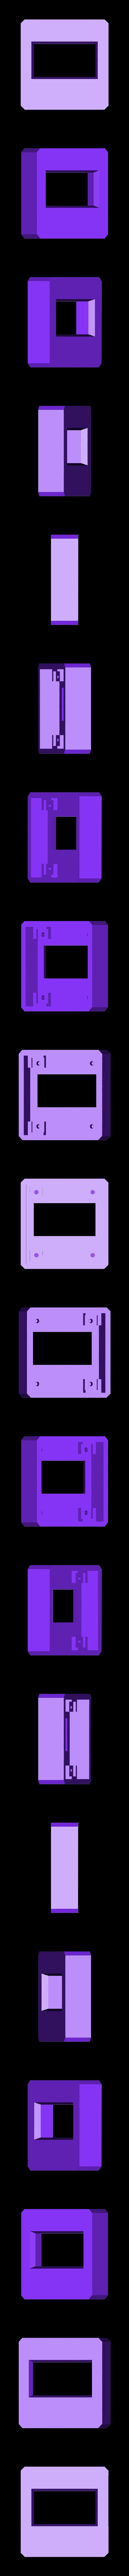 DISPLAY_BODY.stl Télécharger fichier STL gratuit Moniteur OLED OctoPi [WemOled] • Plan imprimable en 3D, theveel